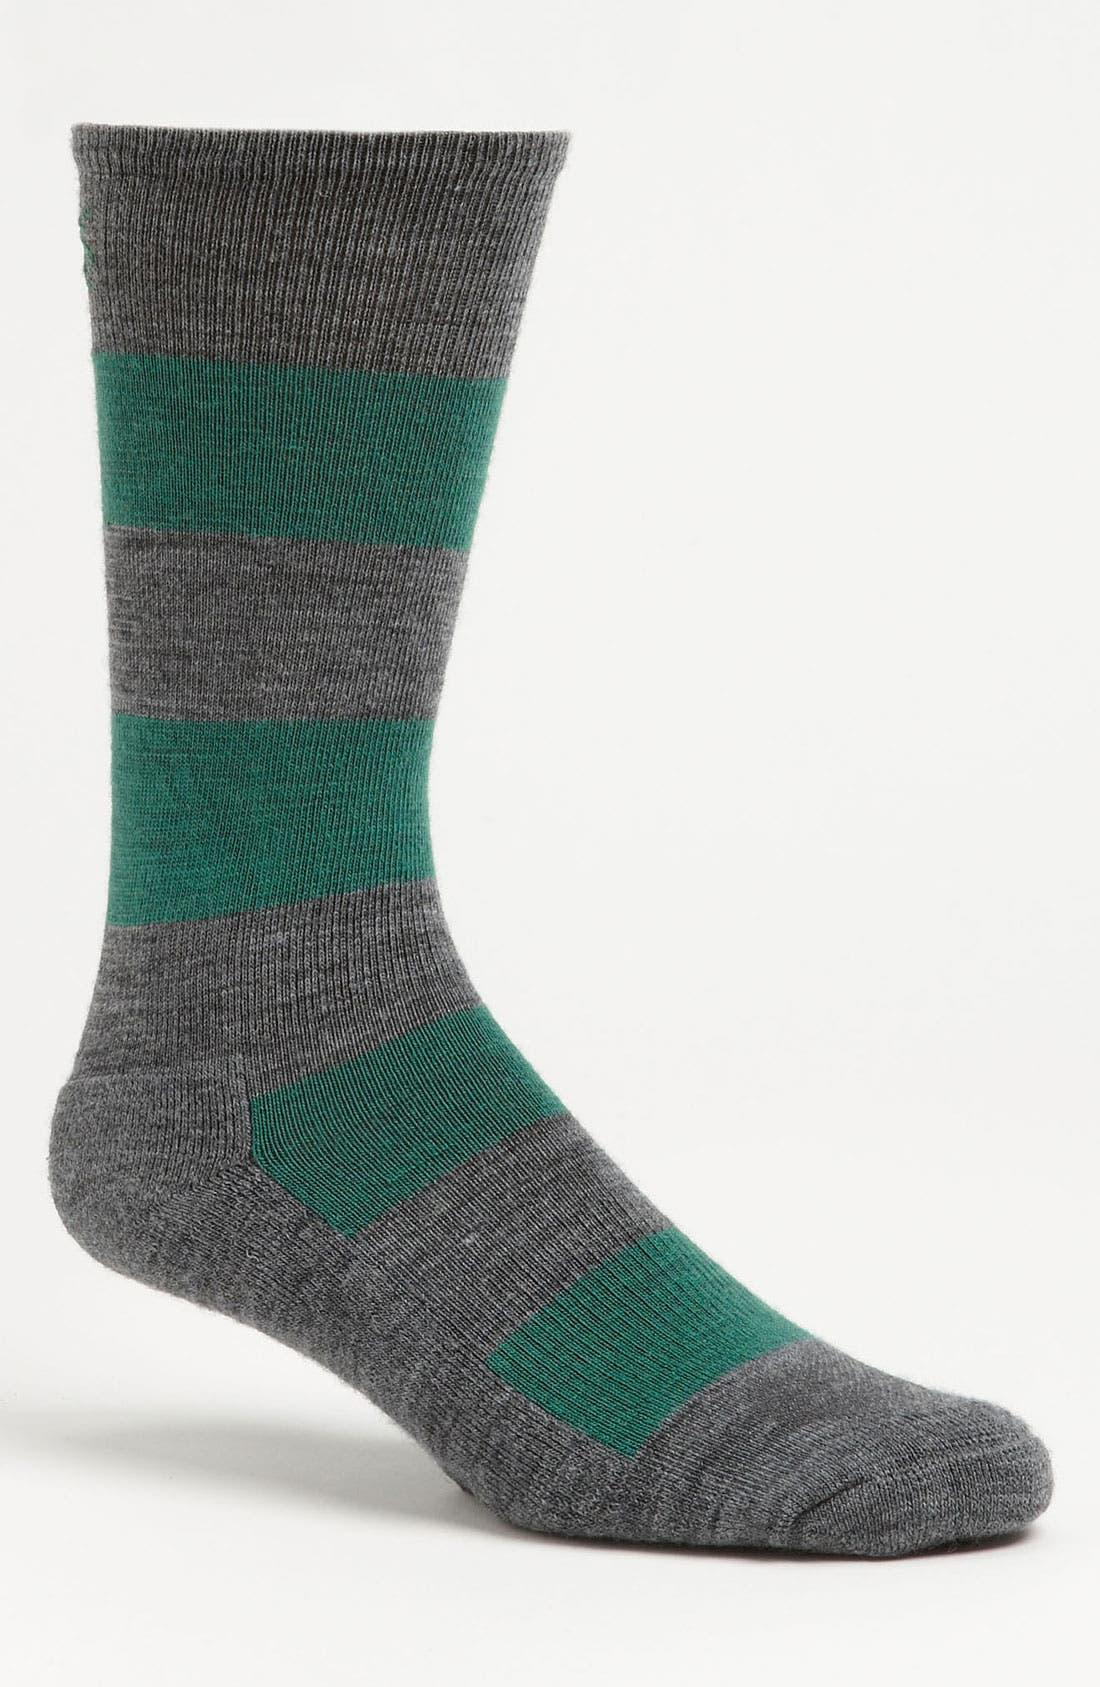 Main Image - Smartwool 'Double Insignia' Socks